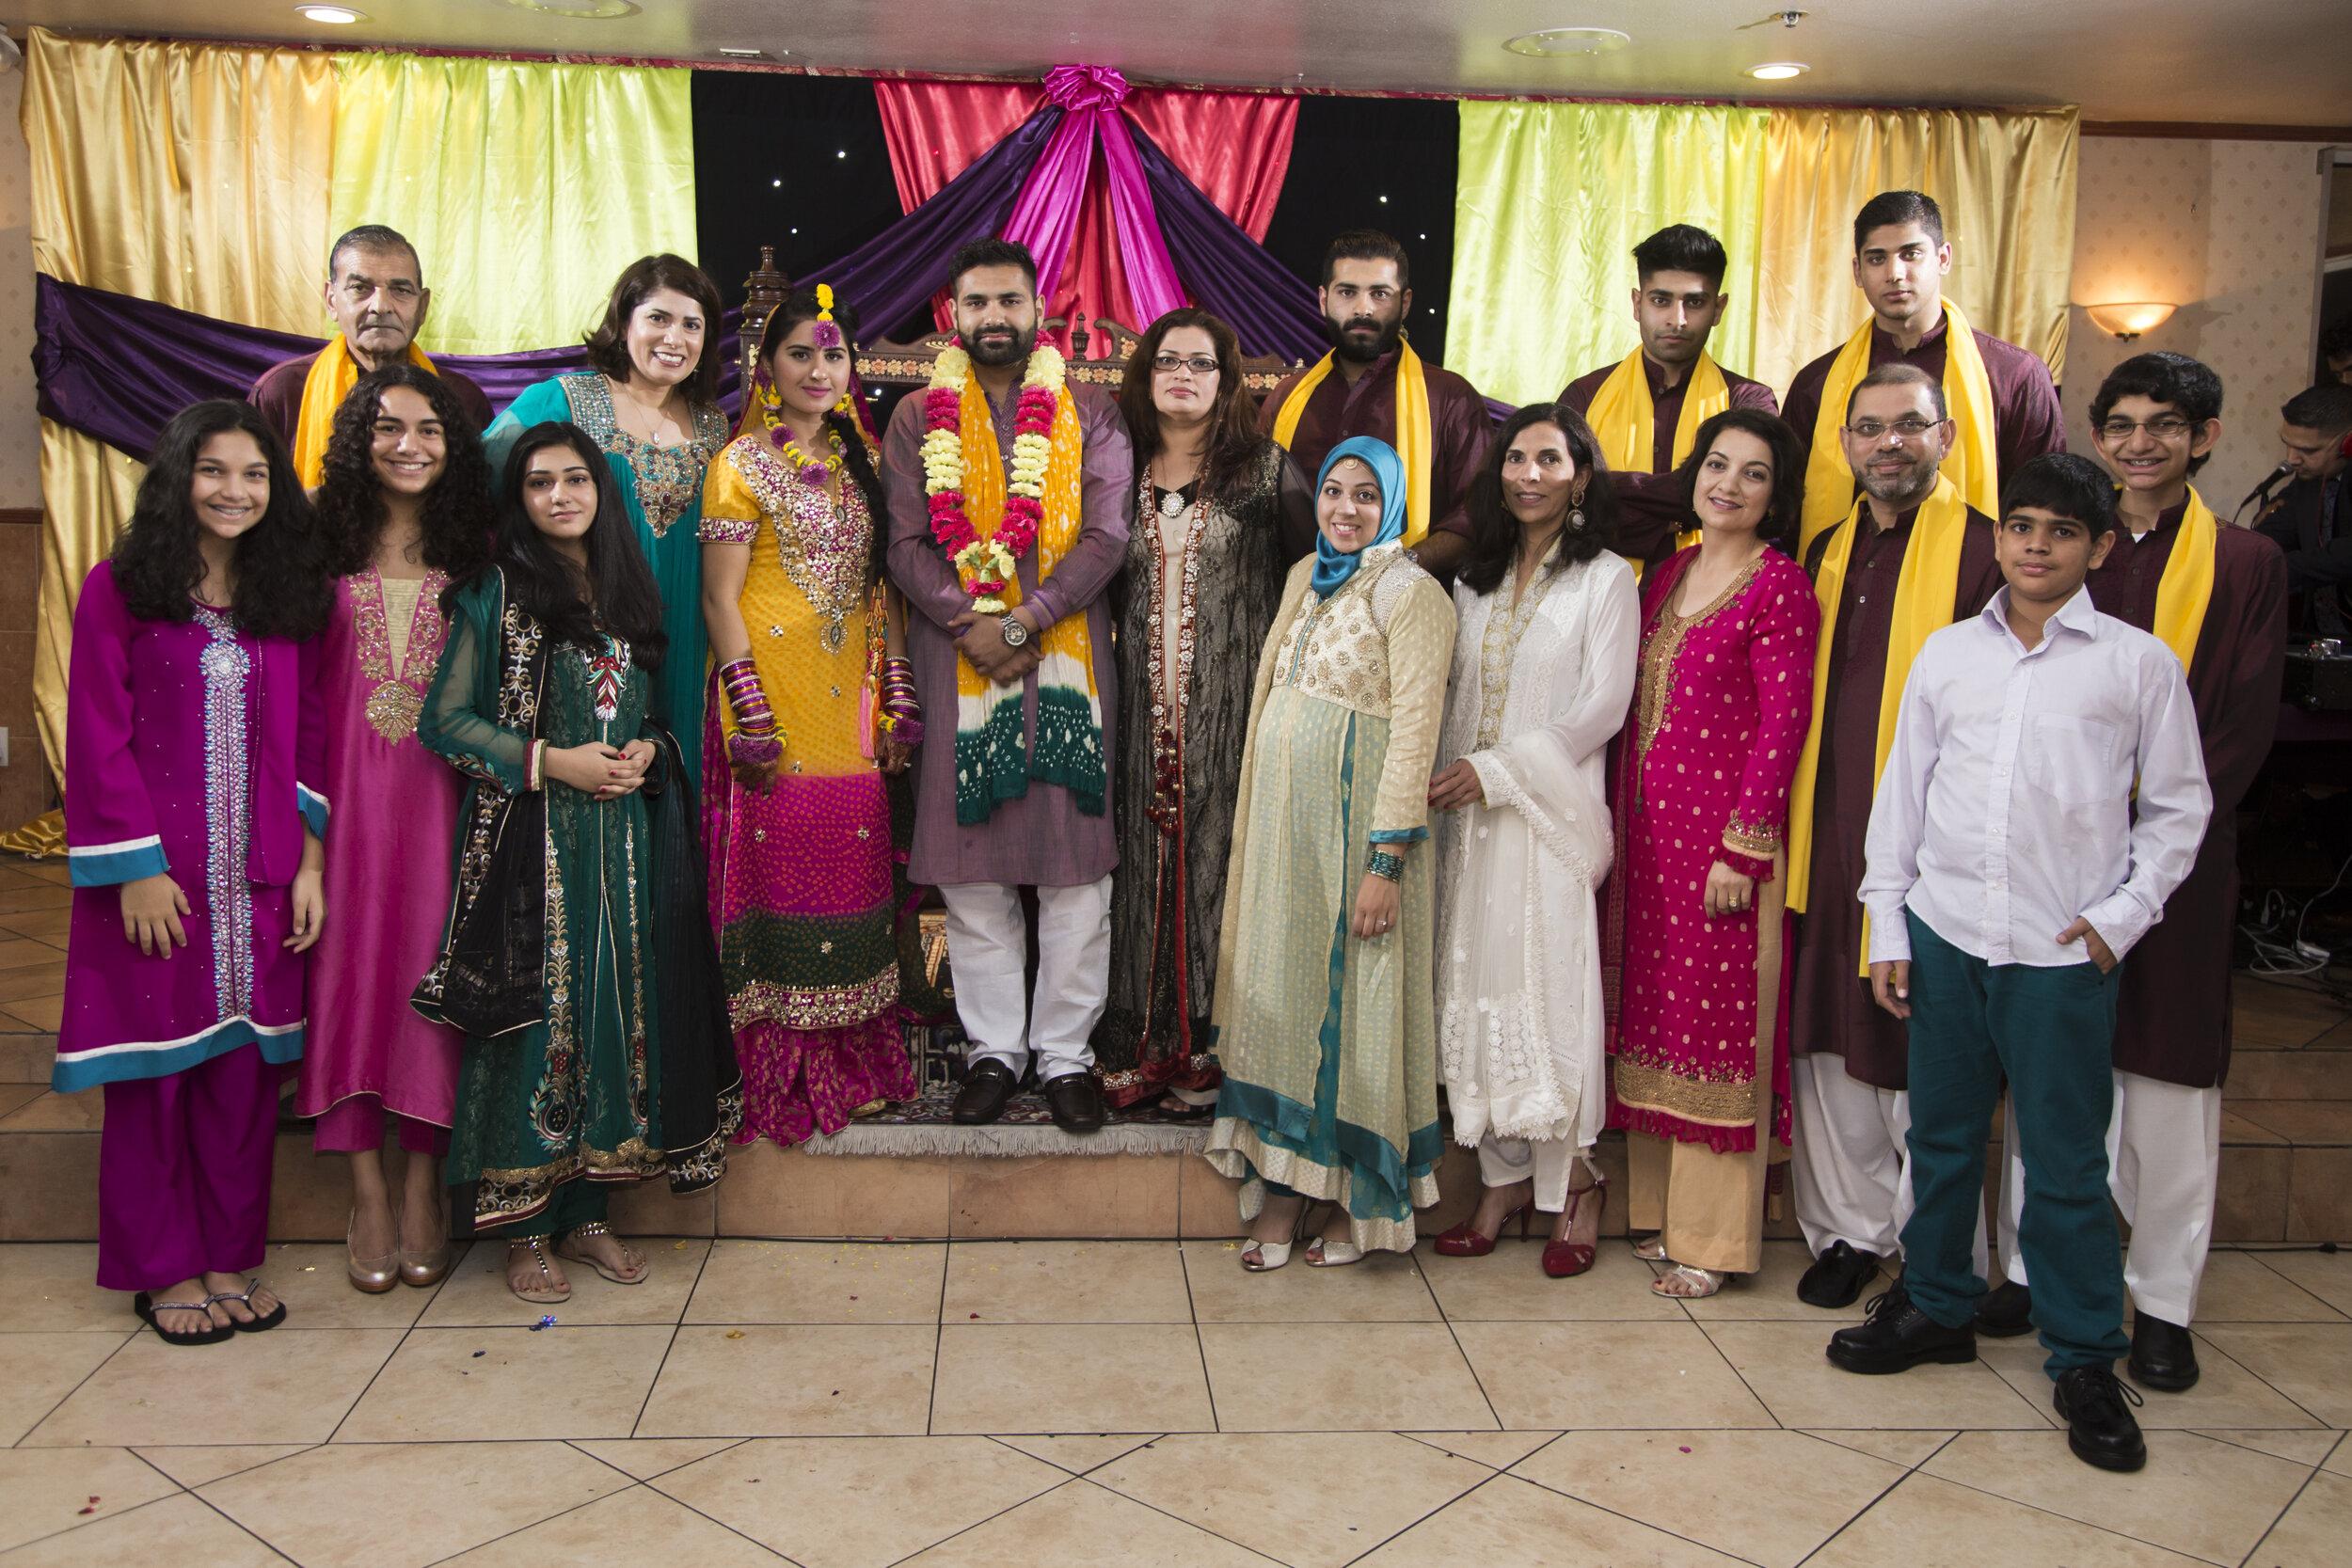 South East Asian Wedding Photo